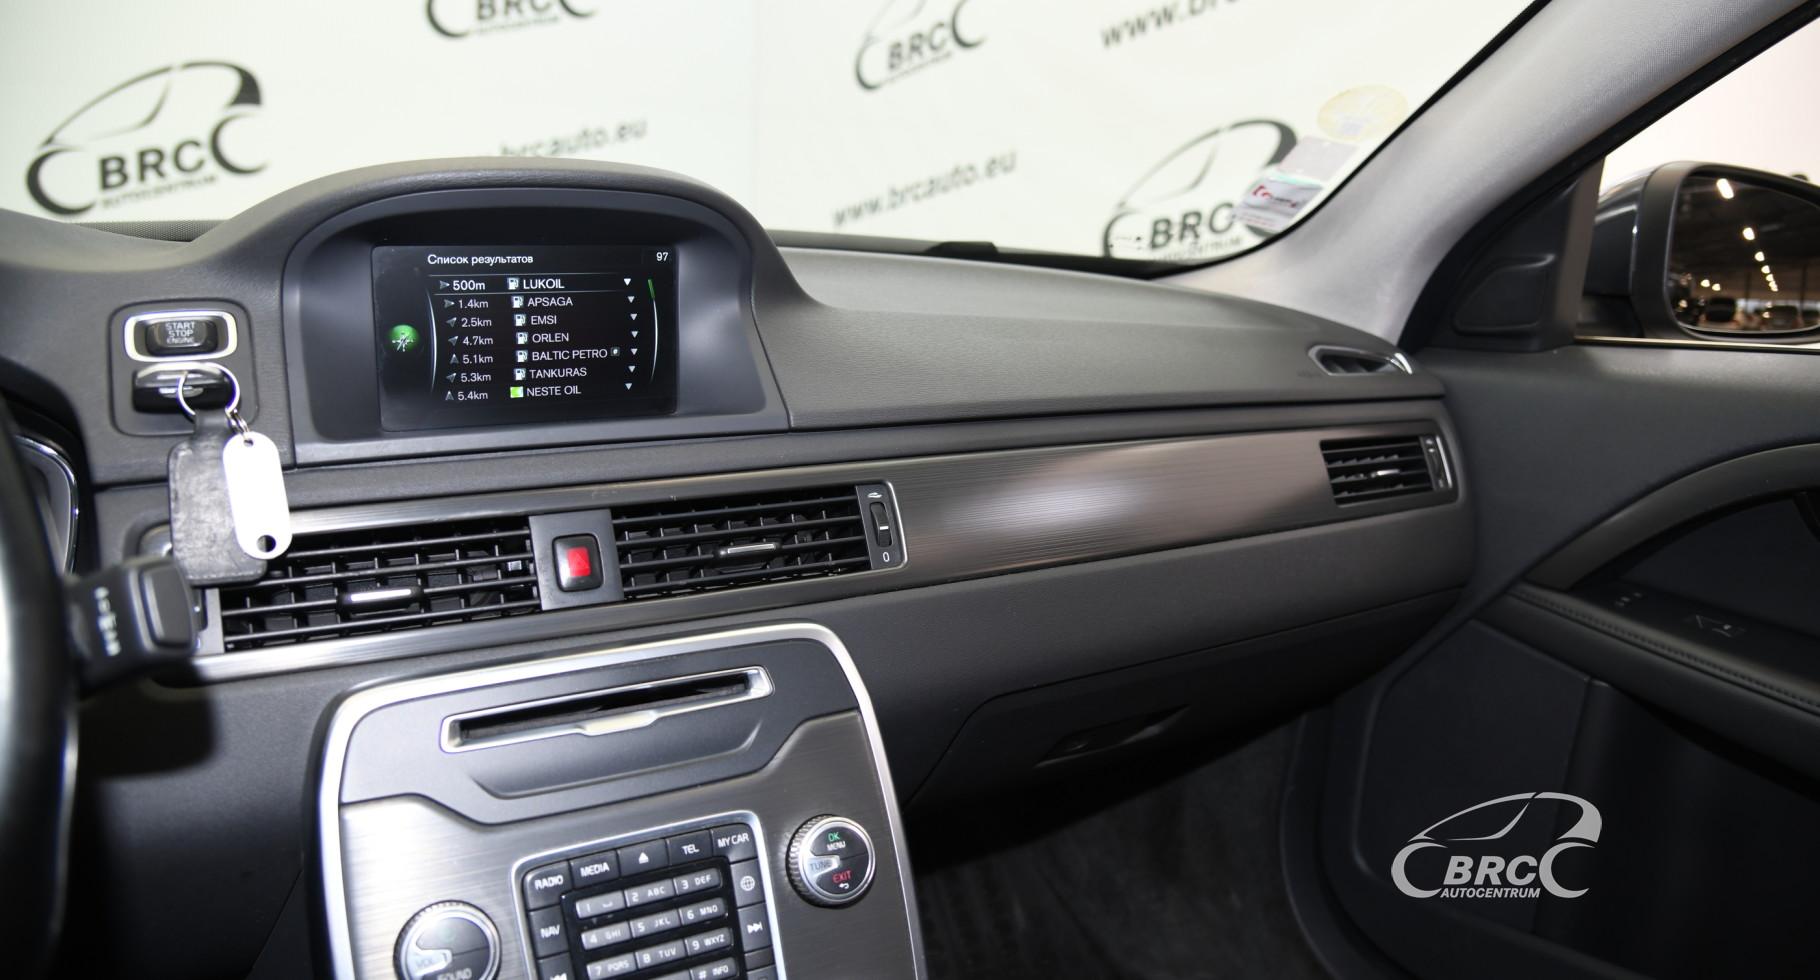 Volvo S80 2.0 D4 Automatas